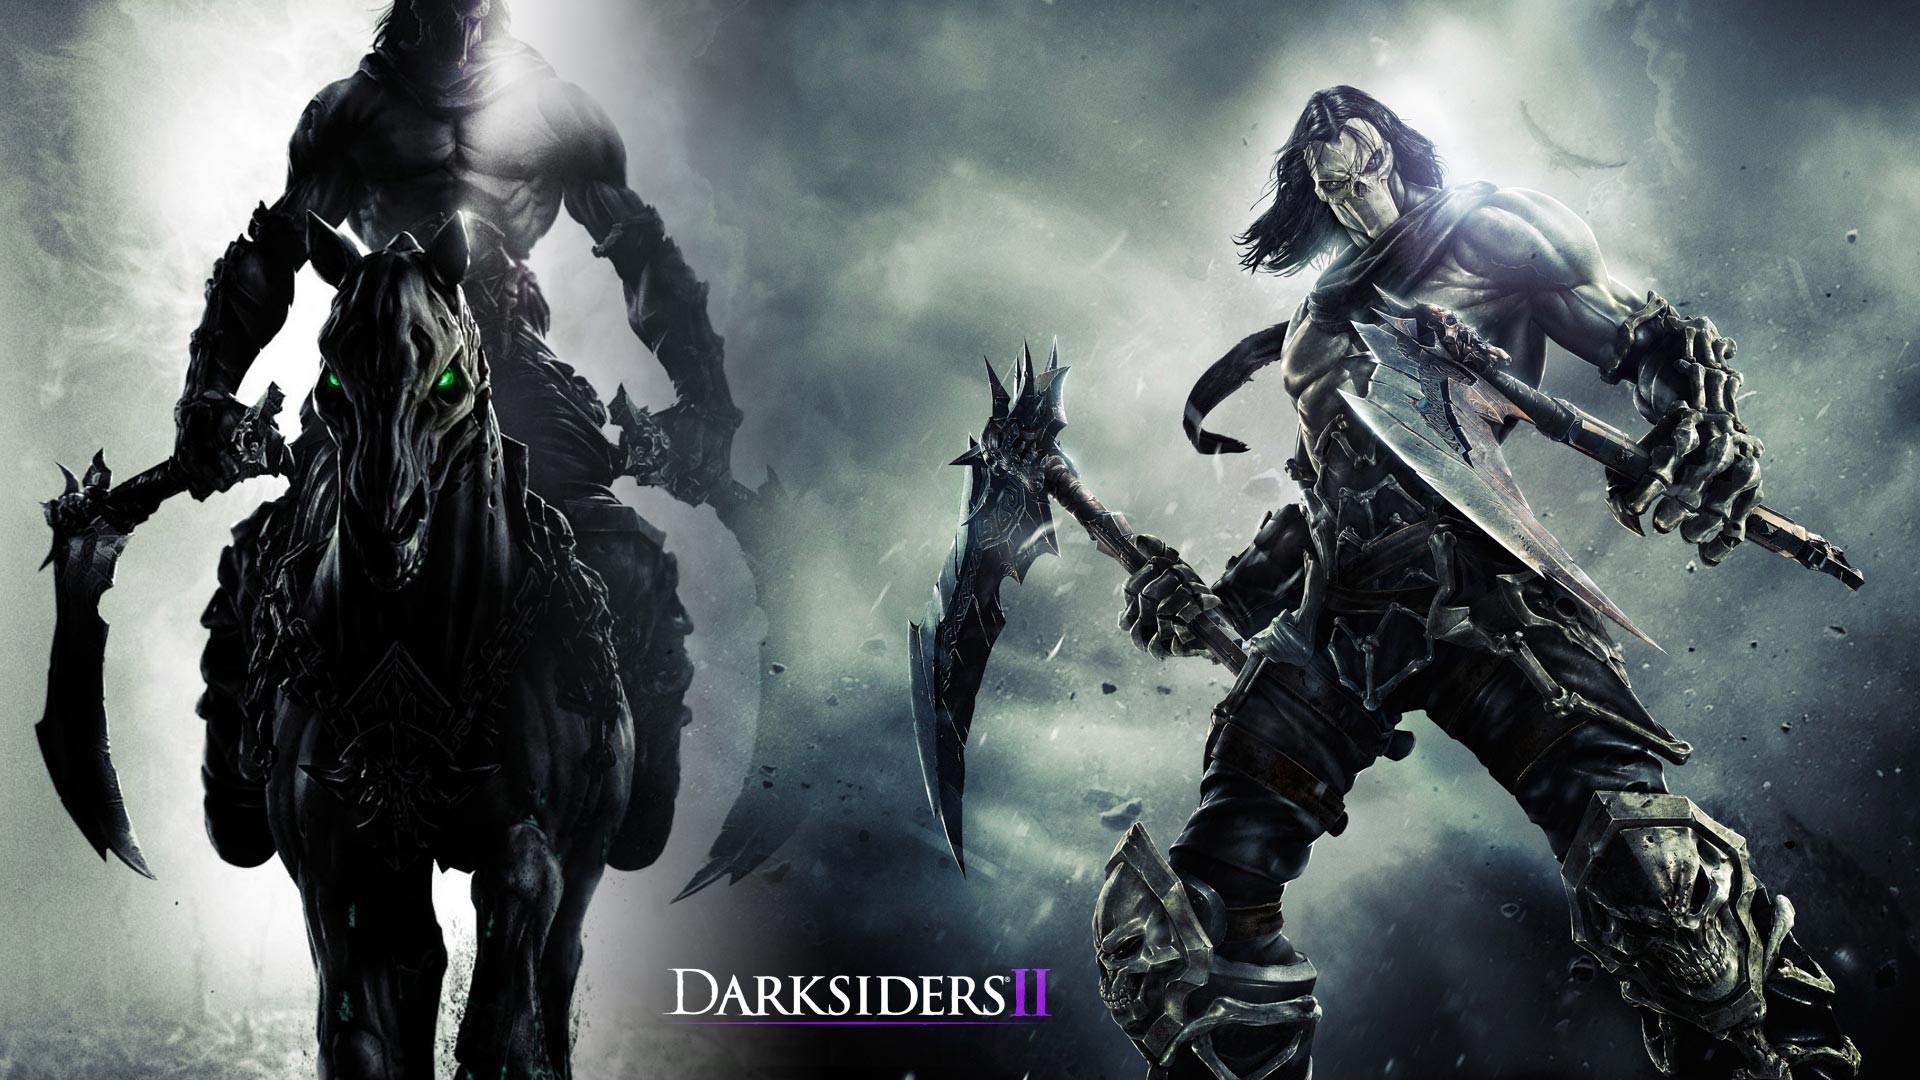 Download-Darksiders-2-Pc-Games-Wallpaper